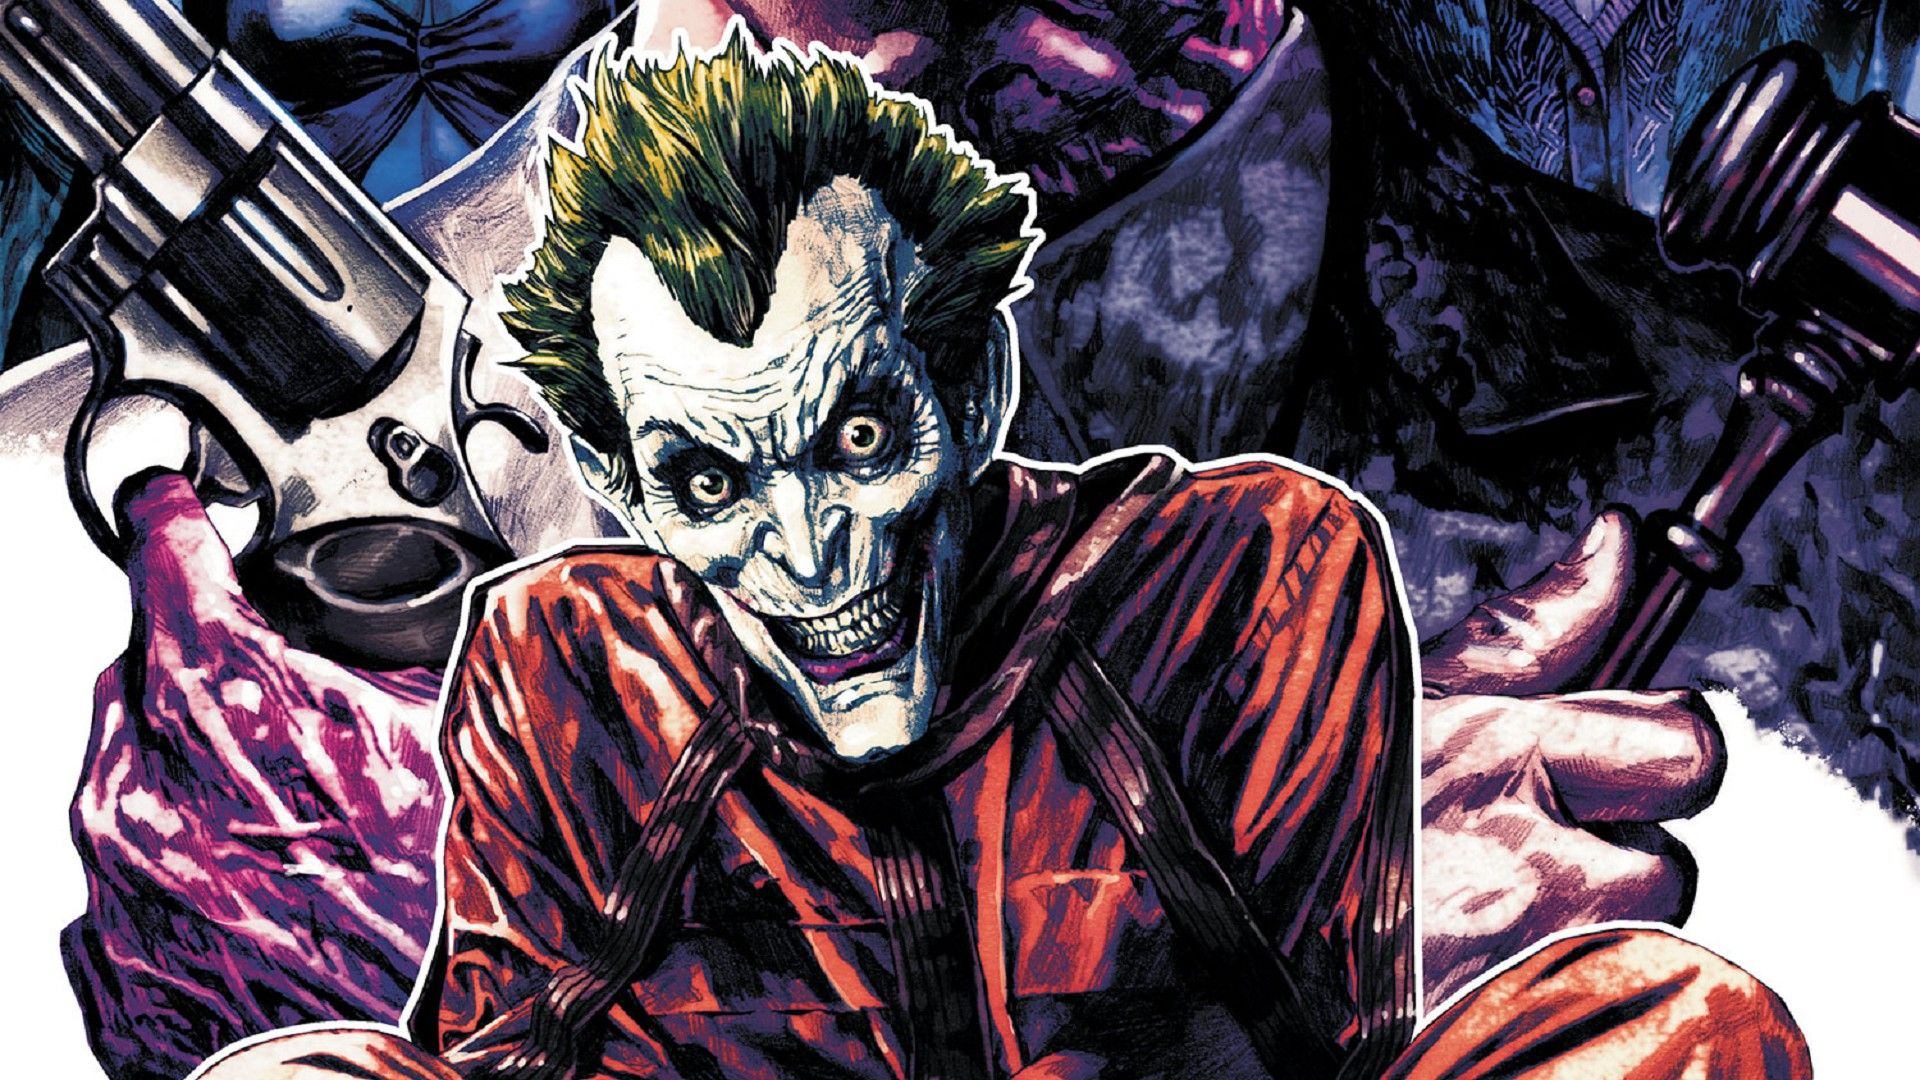 The Joker With Images Joker Comic Joker Wallpapers Joker Hd